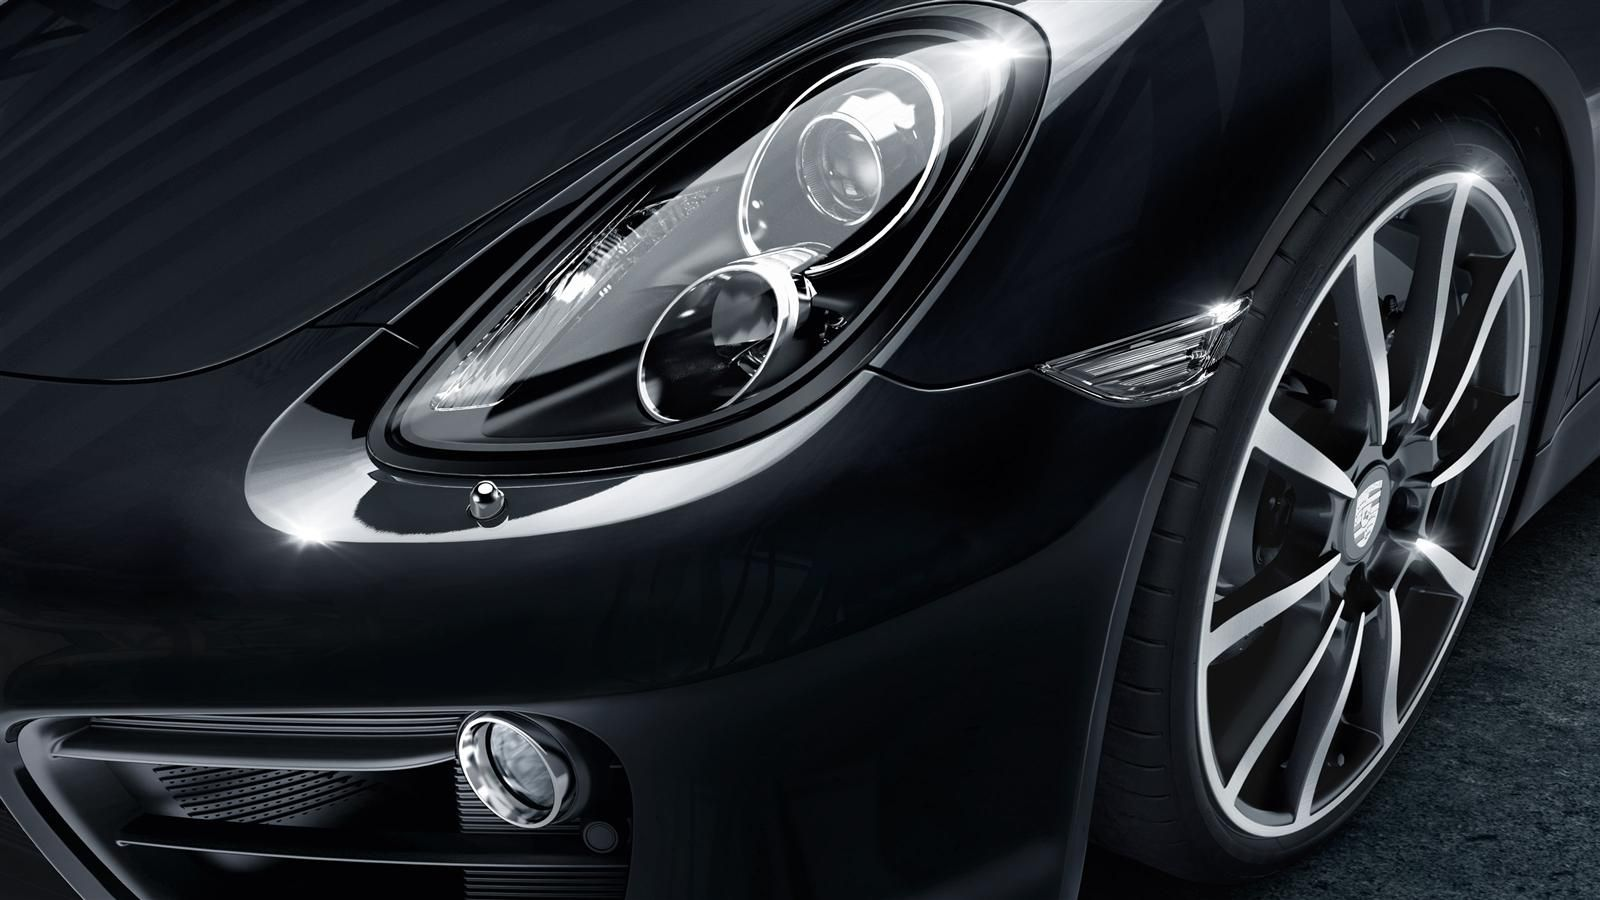 Série limitée Porsche Cayman Volkswagen phaeton, Porsche